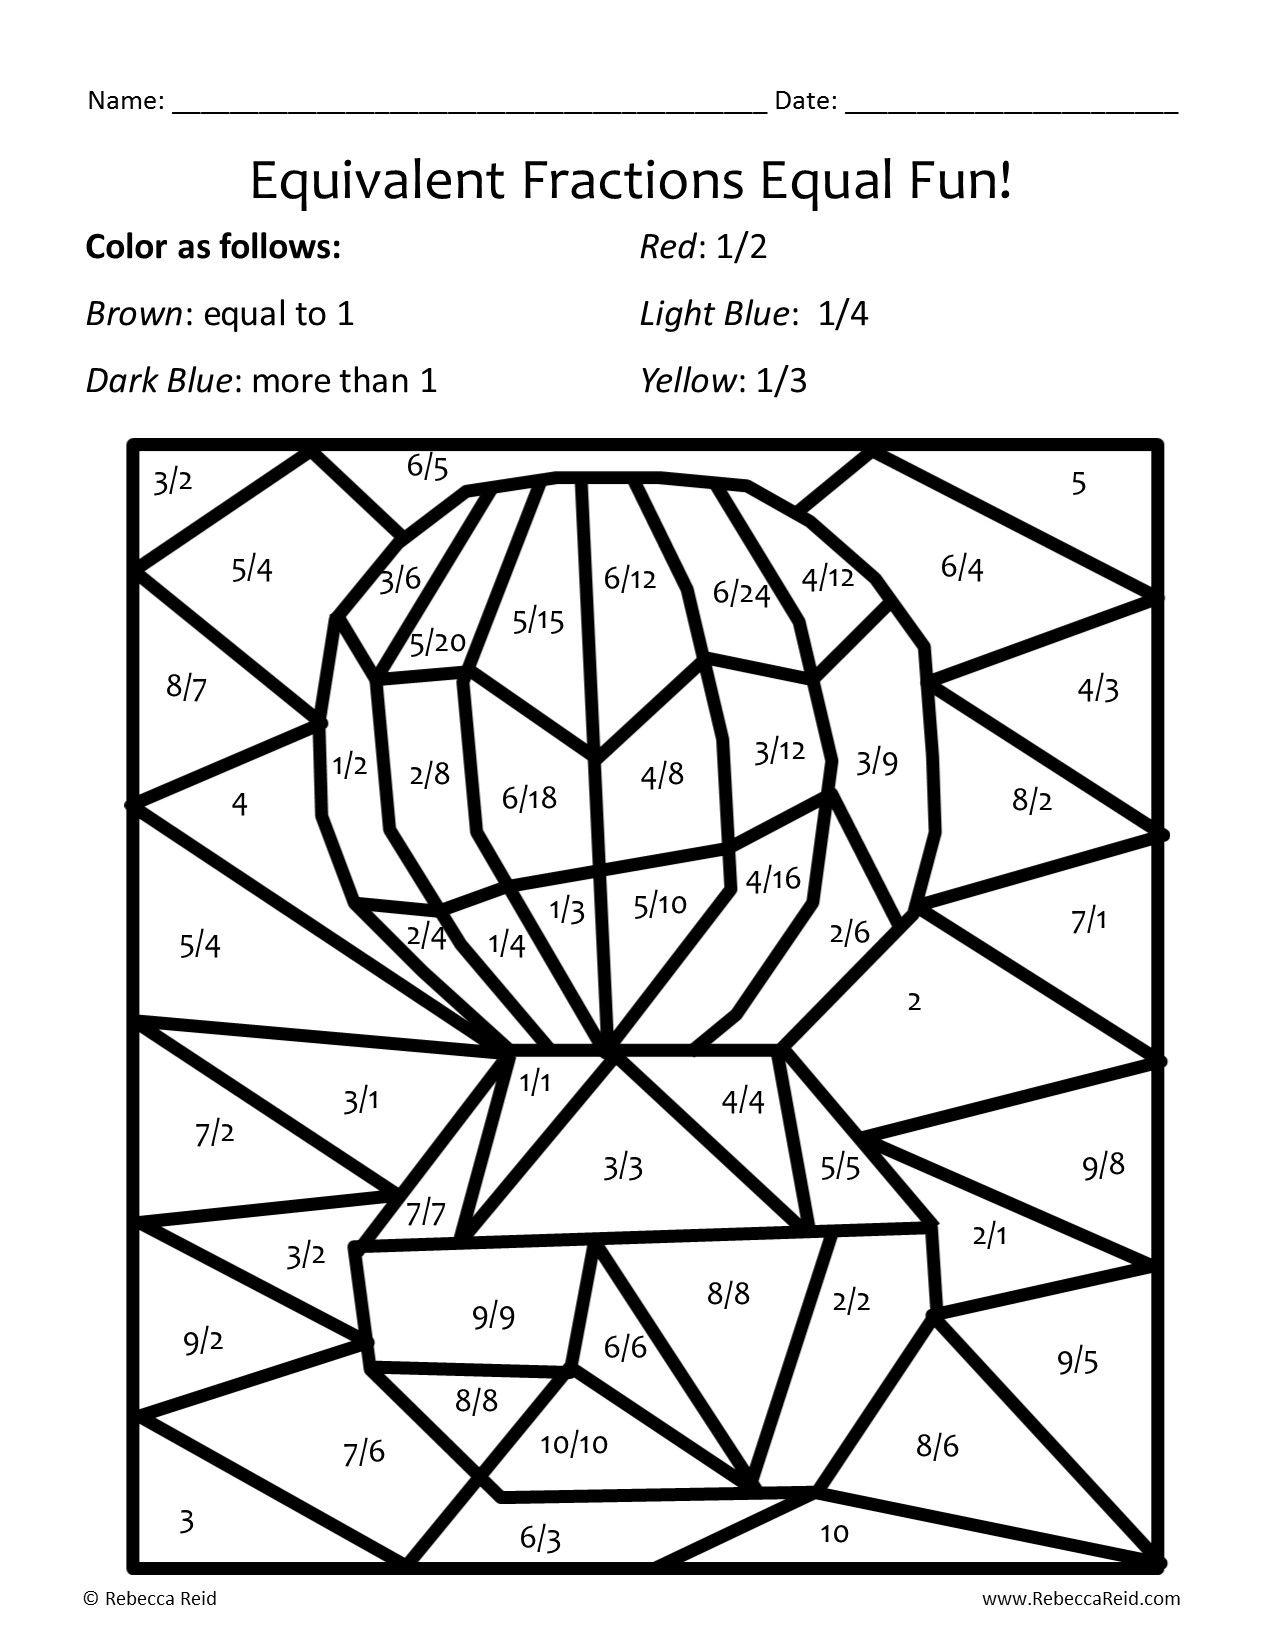 Equivalent Fractions Image 1 275 1 650 Pixels